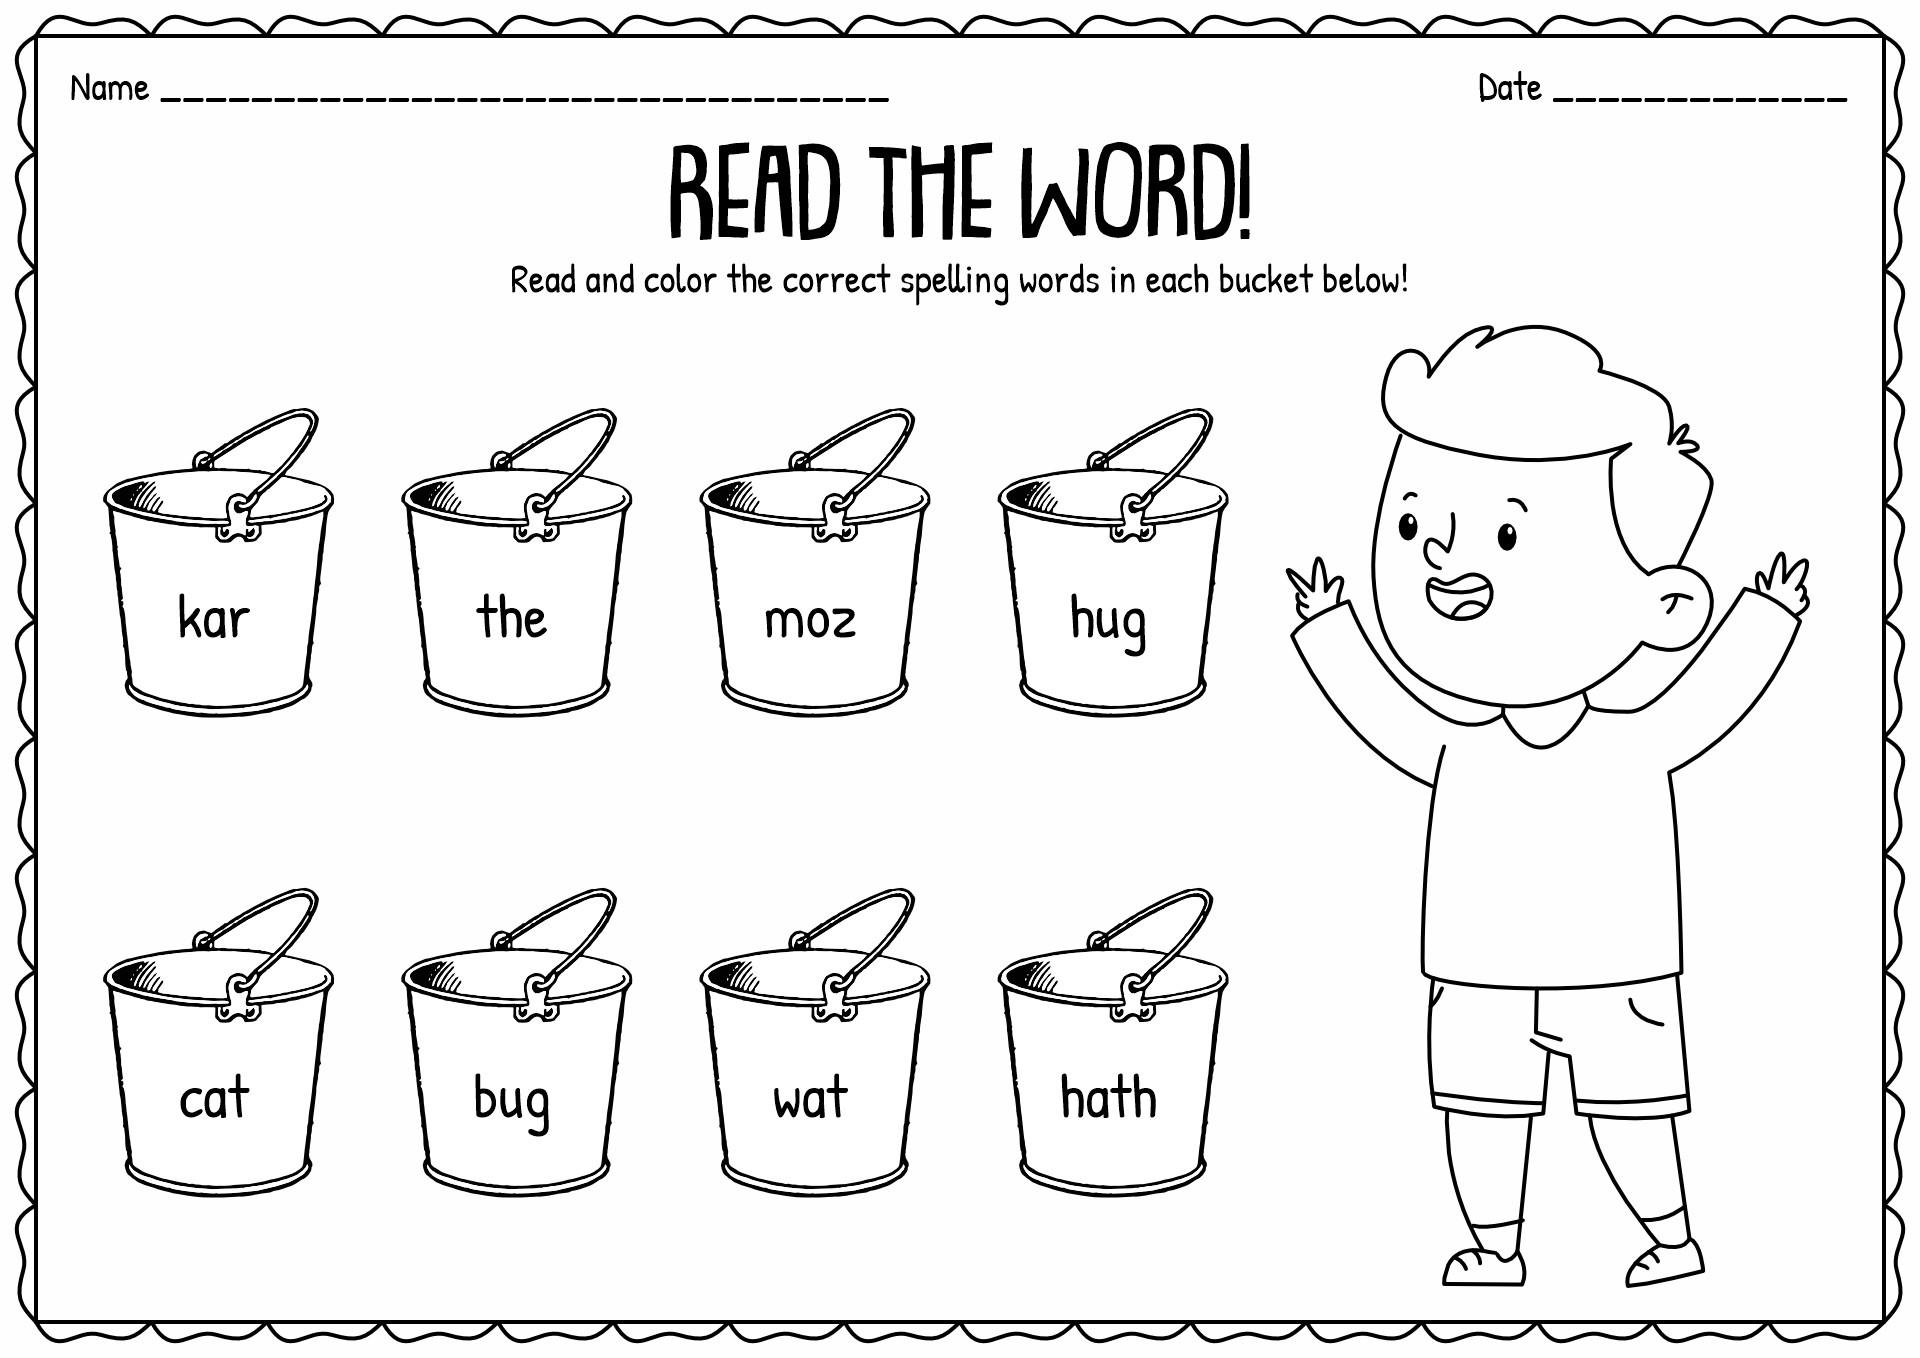 18 Best Images of Print Syllable Worksheets Kindergarten